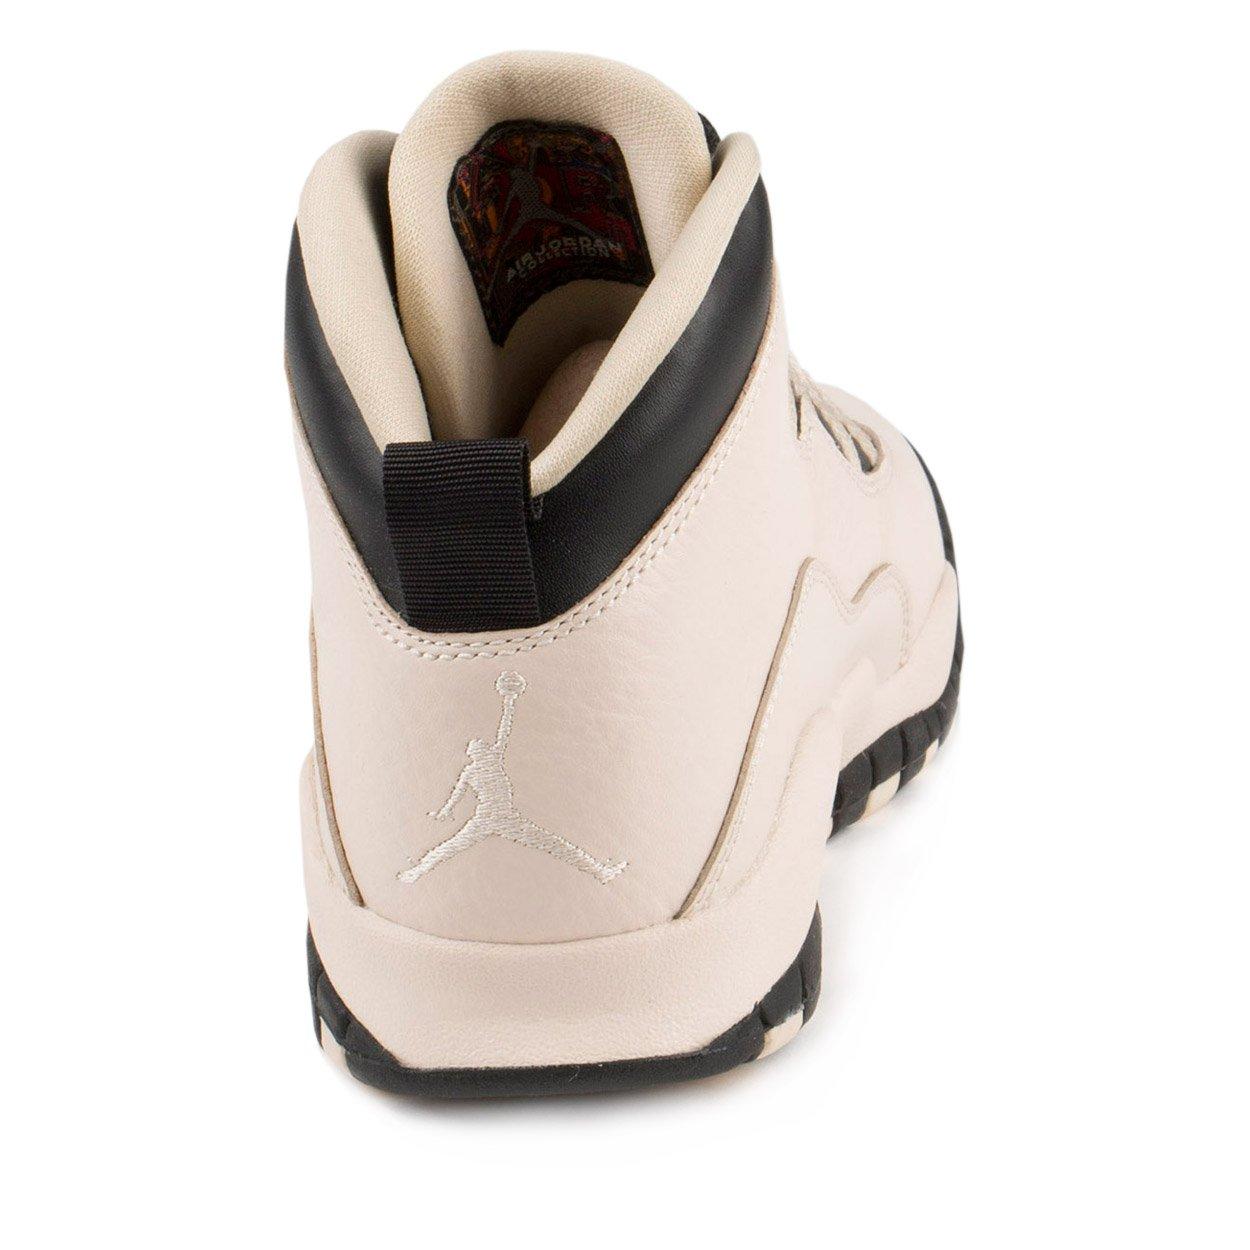 Jordan Nike Kids 10 Retro Prem GG Pearl White/Black/Black Basketball Shoe 6.5 Kids US by Jordan (Image #4)